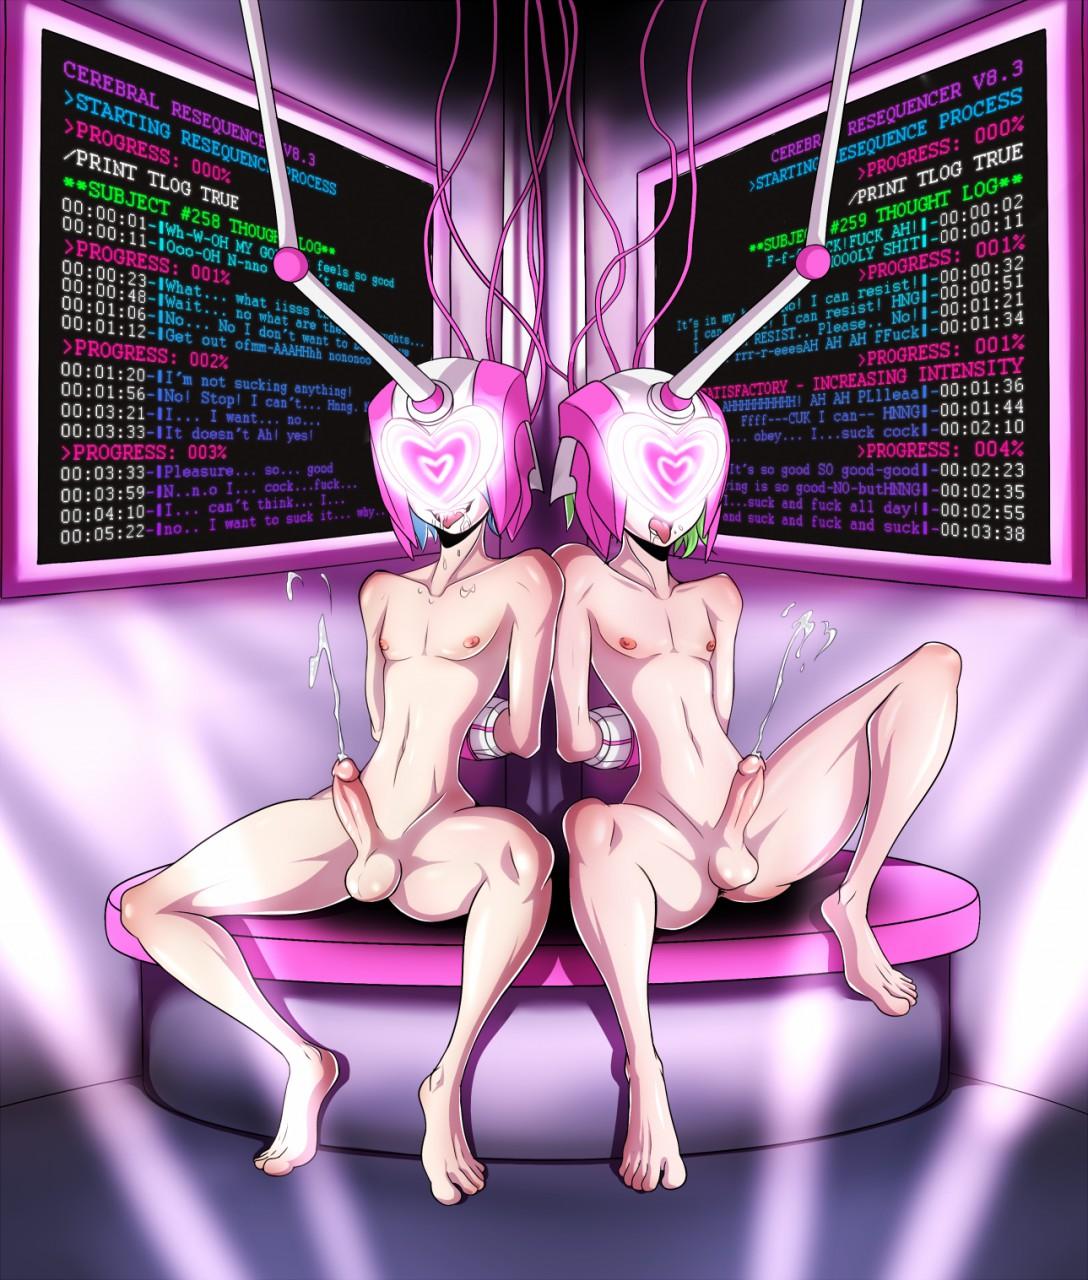 Showing media posts for mind control orgasm XXX